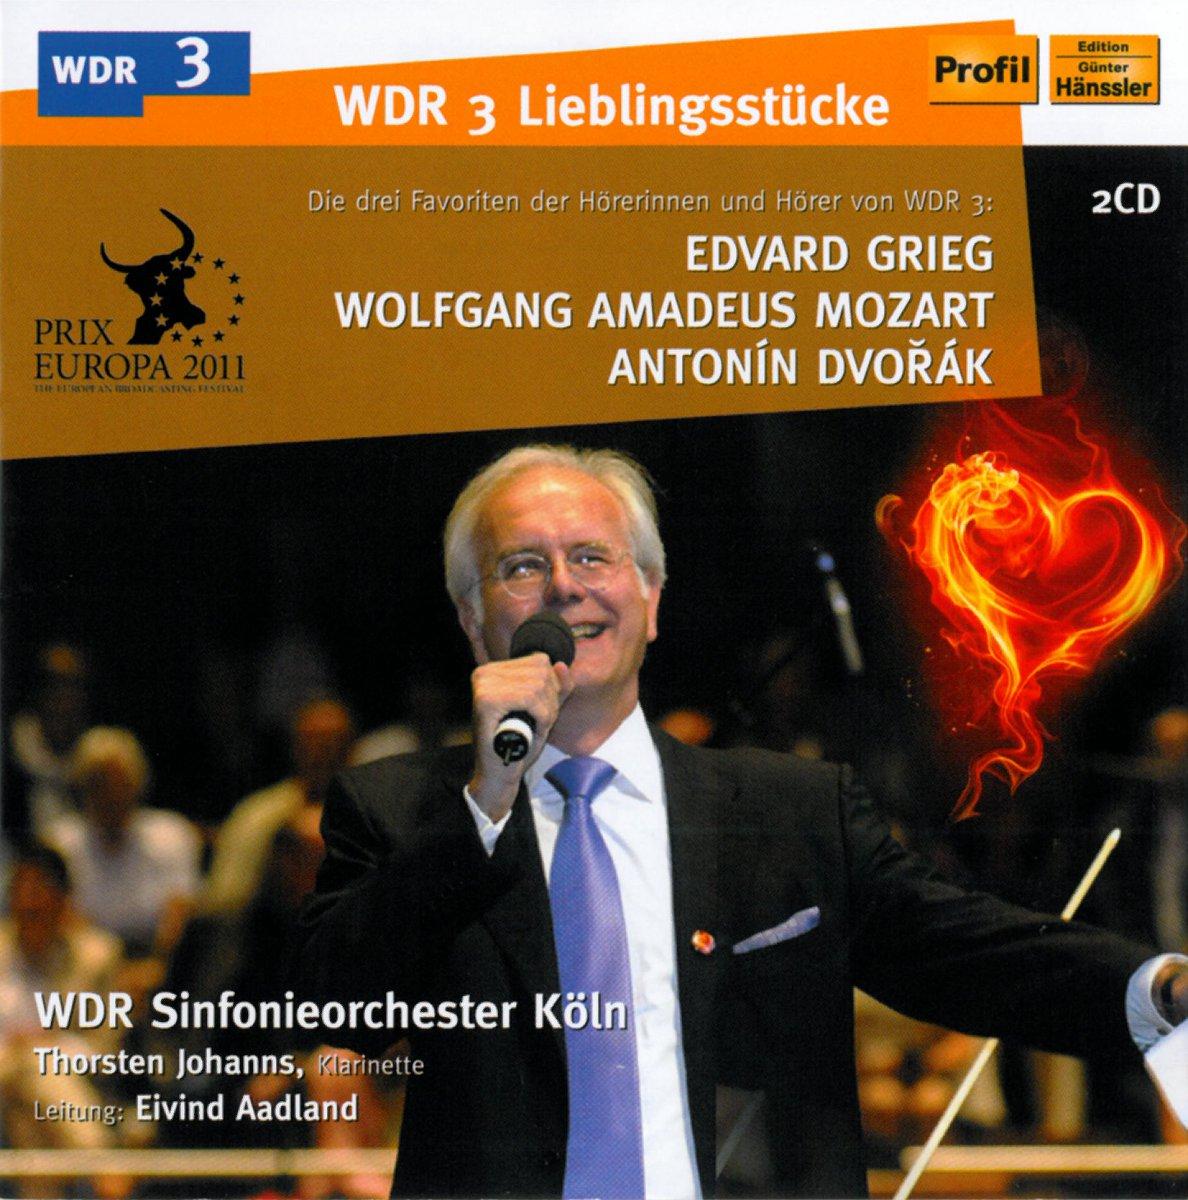 WDR 3 Lieblingsstücke